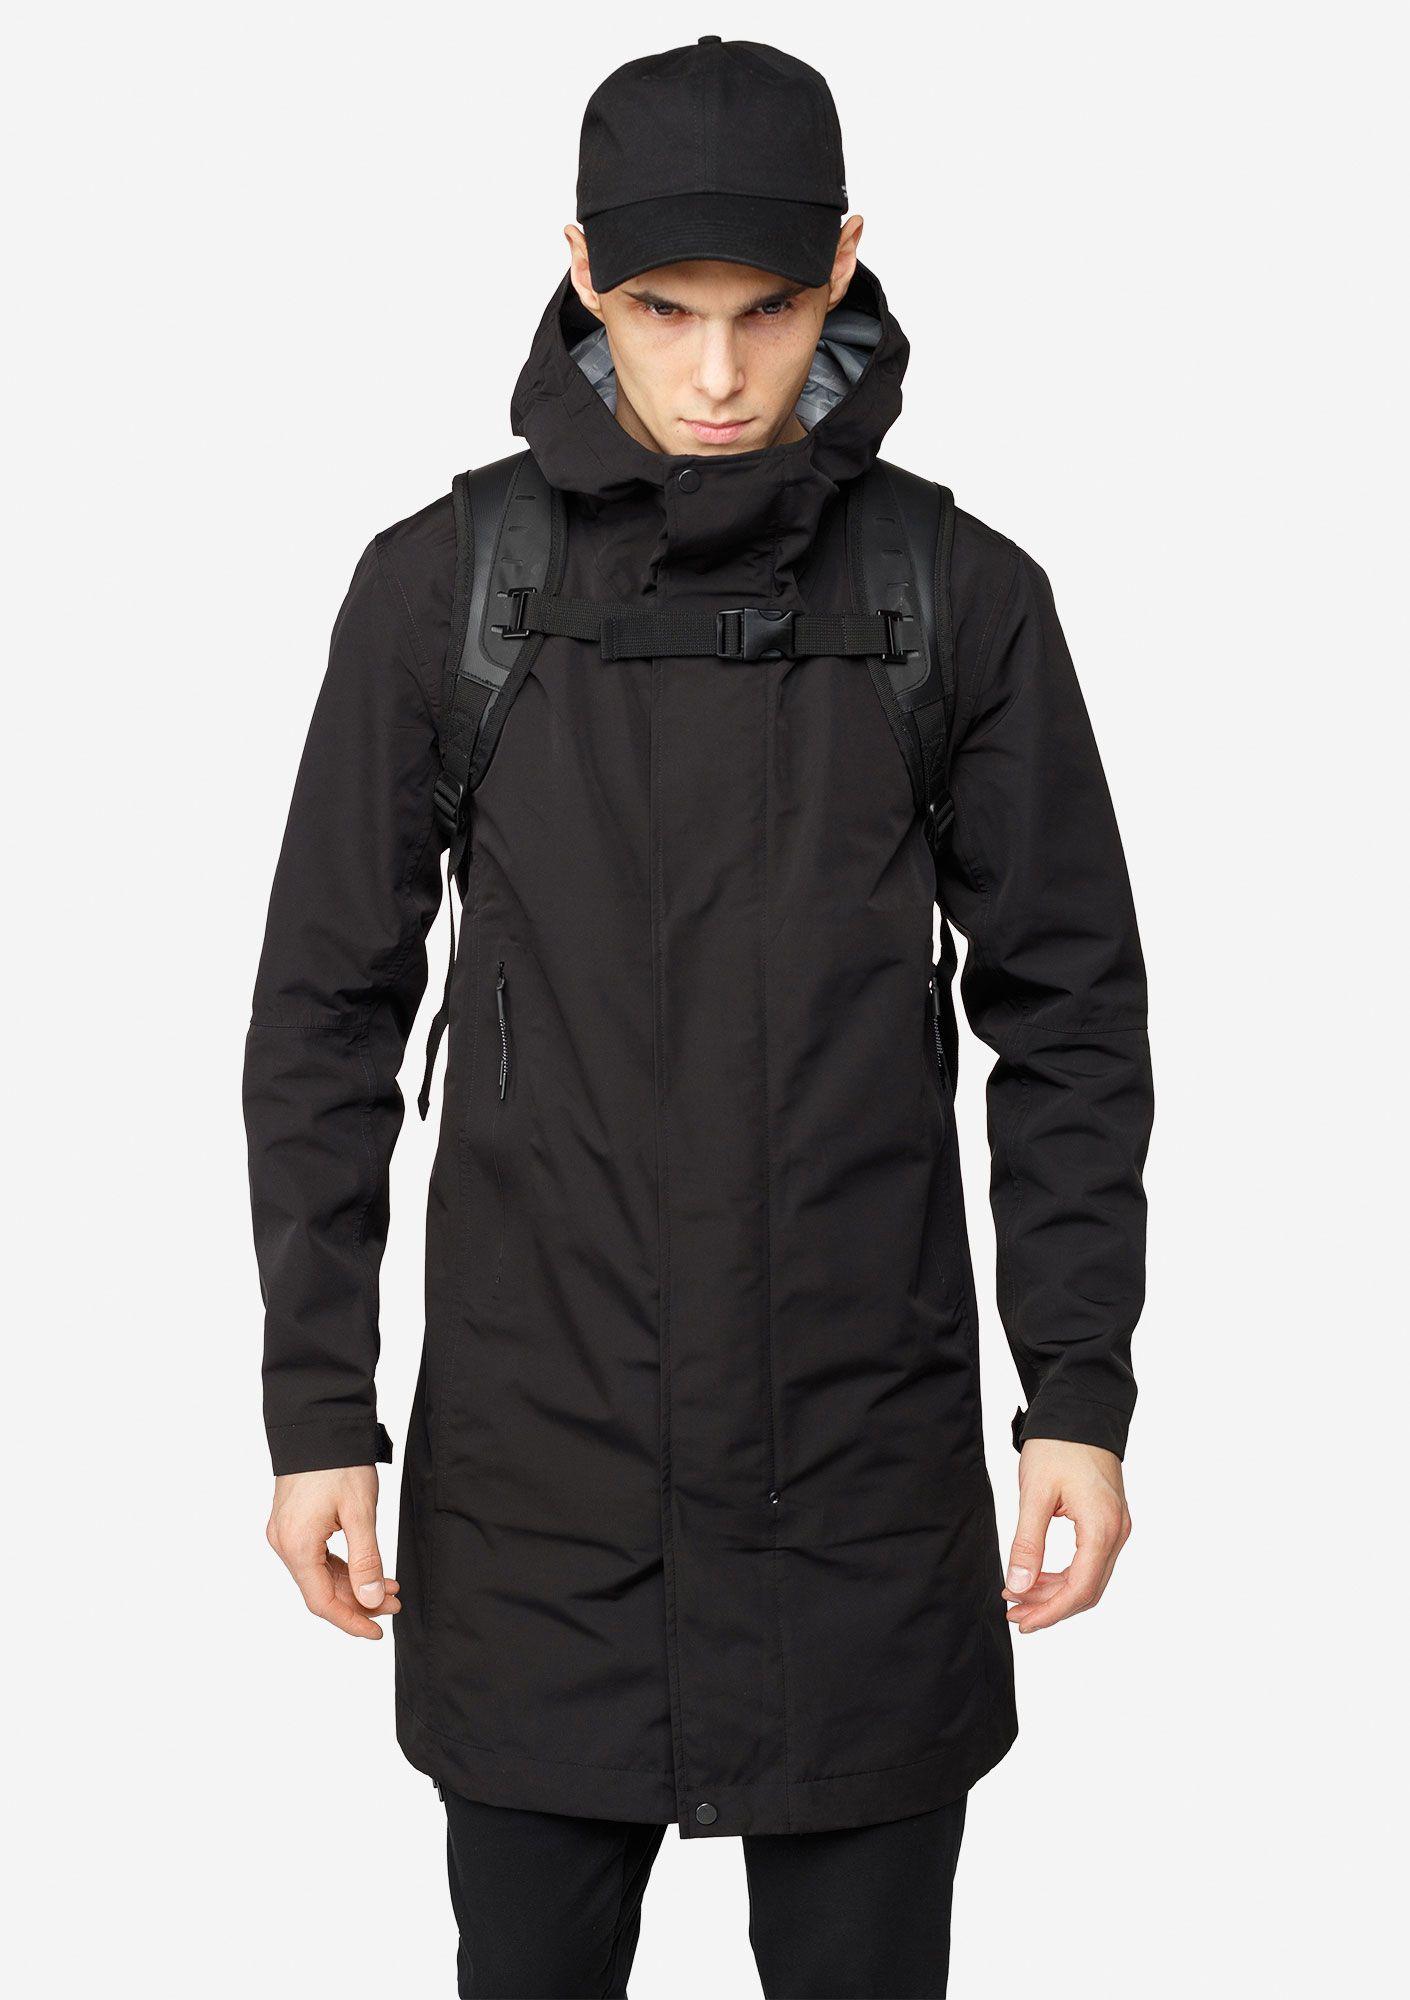 nuovo di zecca bdf09 549c8 Krakatau Winter/Rain Jacket. | Clothes in 2019 - Kleding